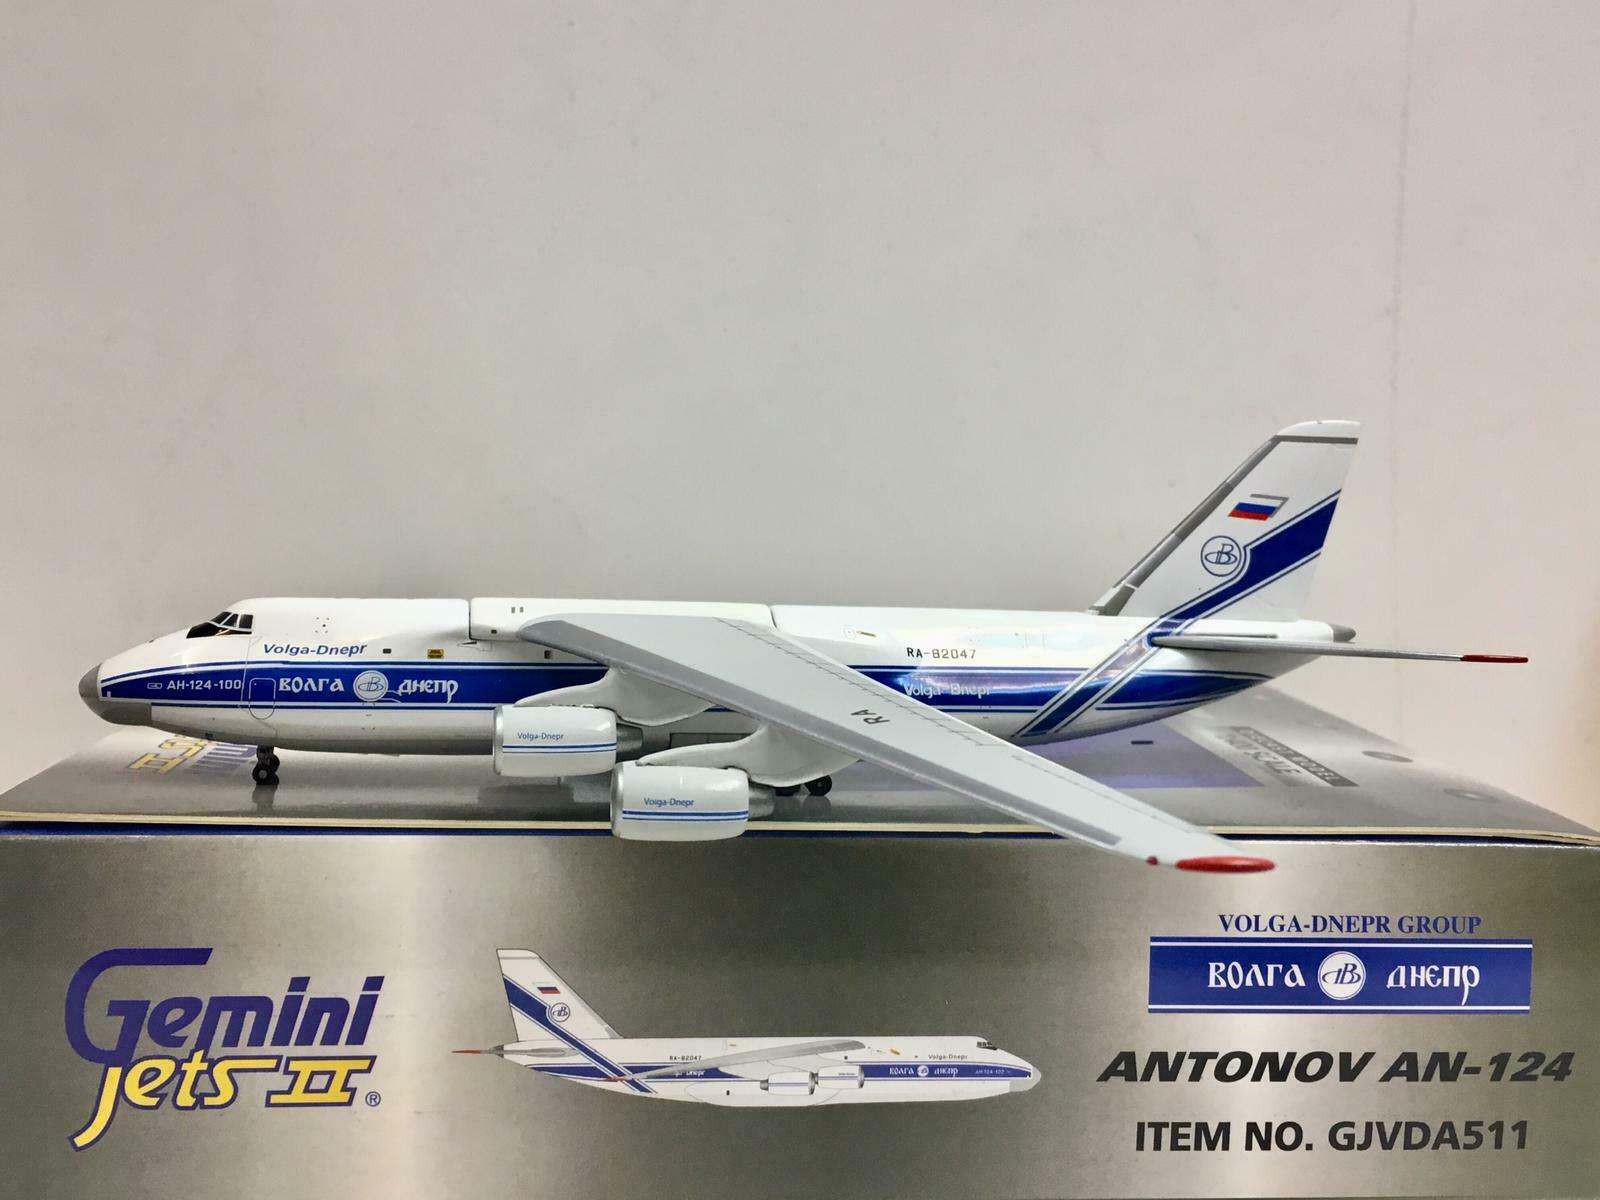 Gemini Jets 1 400 Volga Dnepr Antonov AN-124 RA-82047 gjvda 511